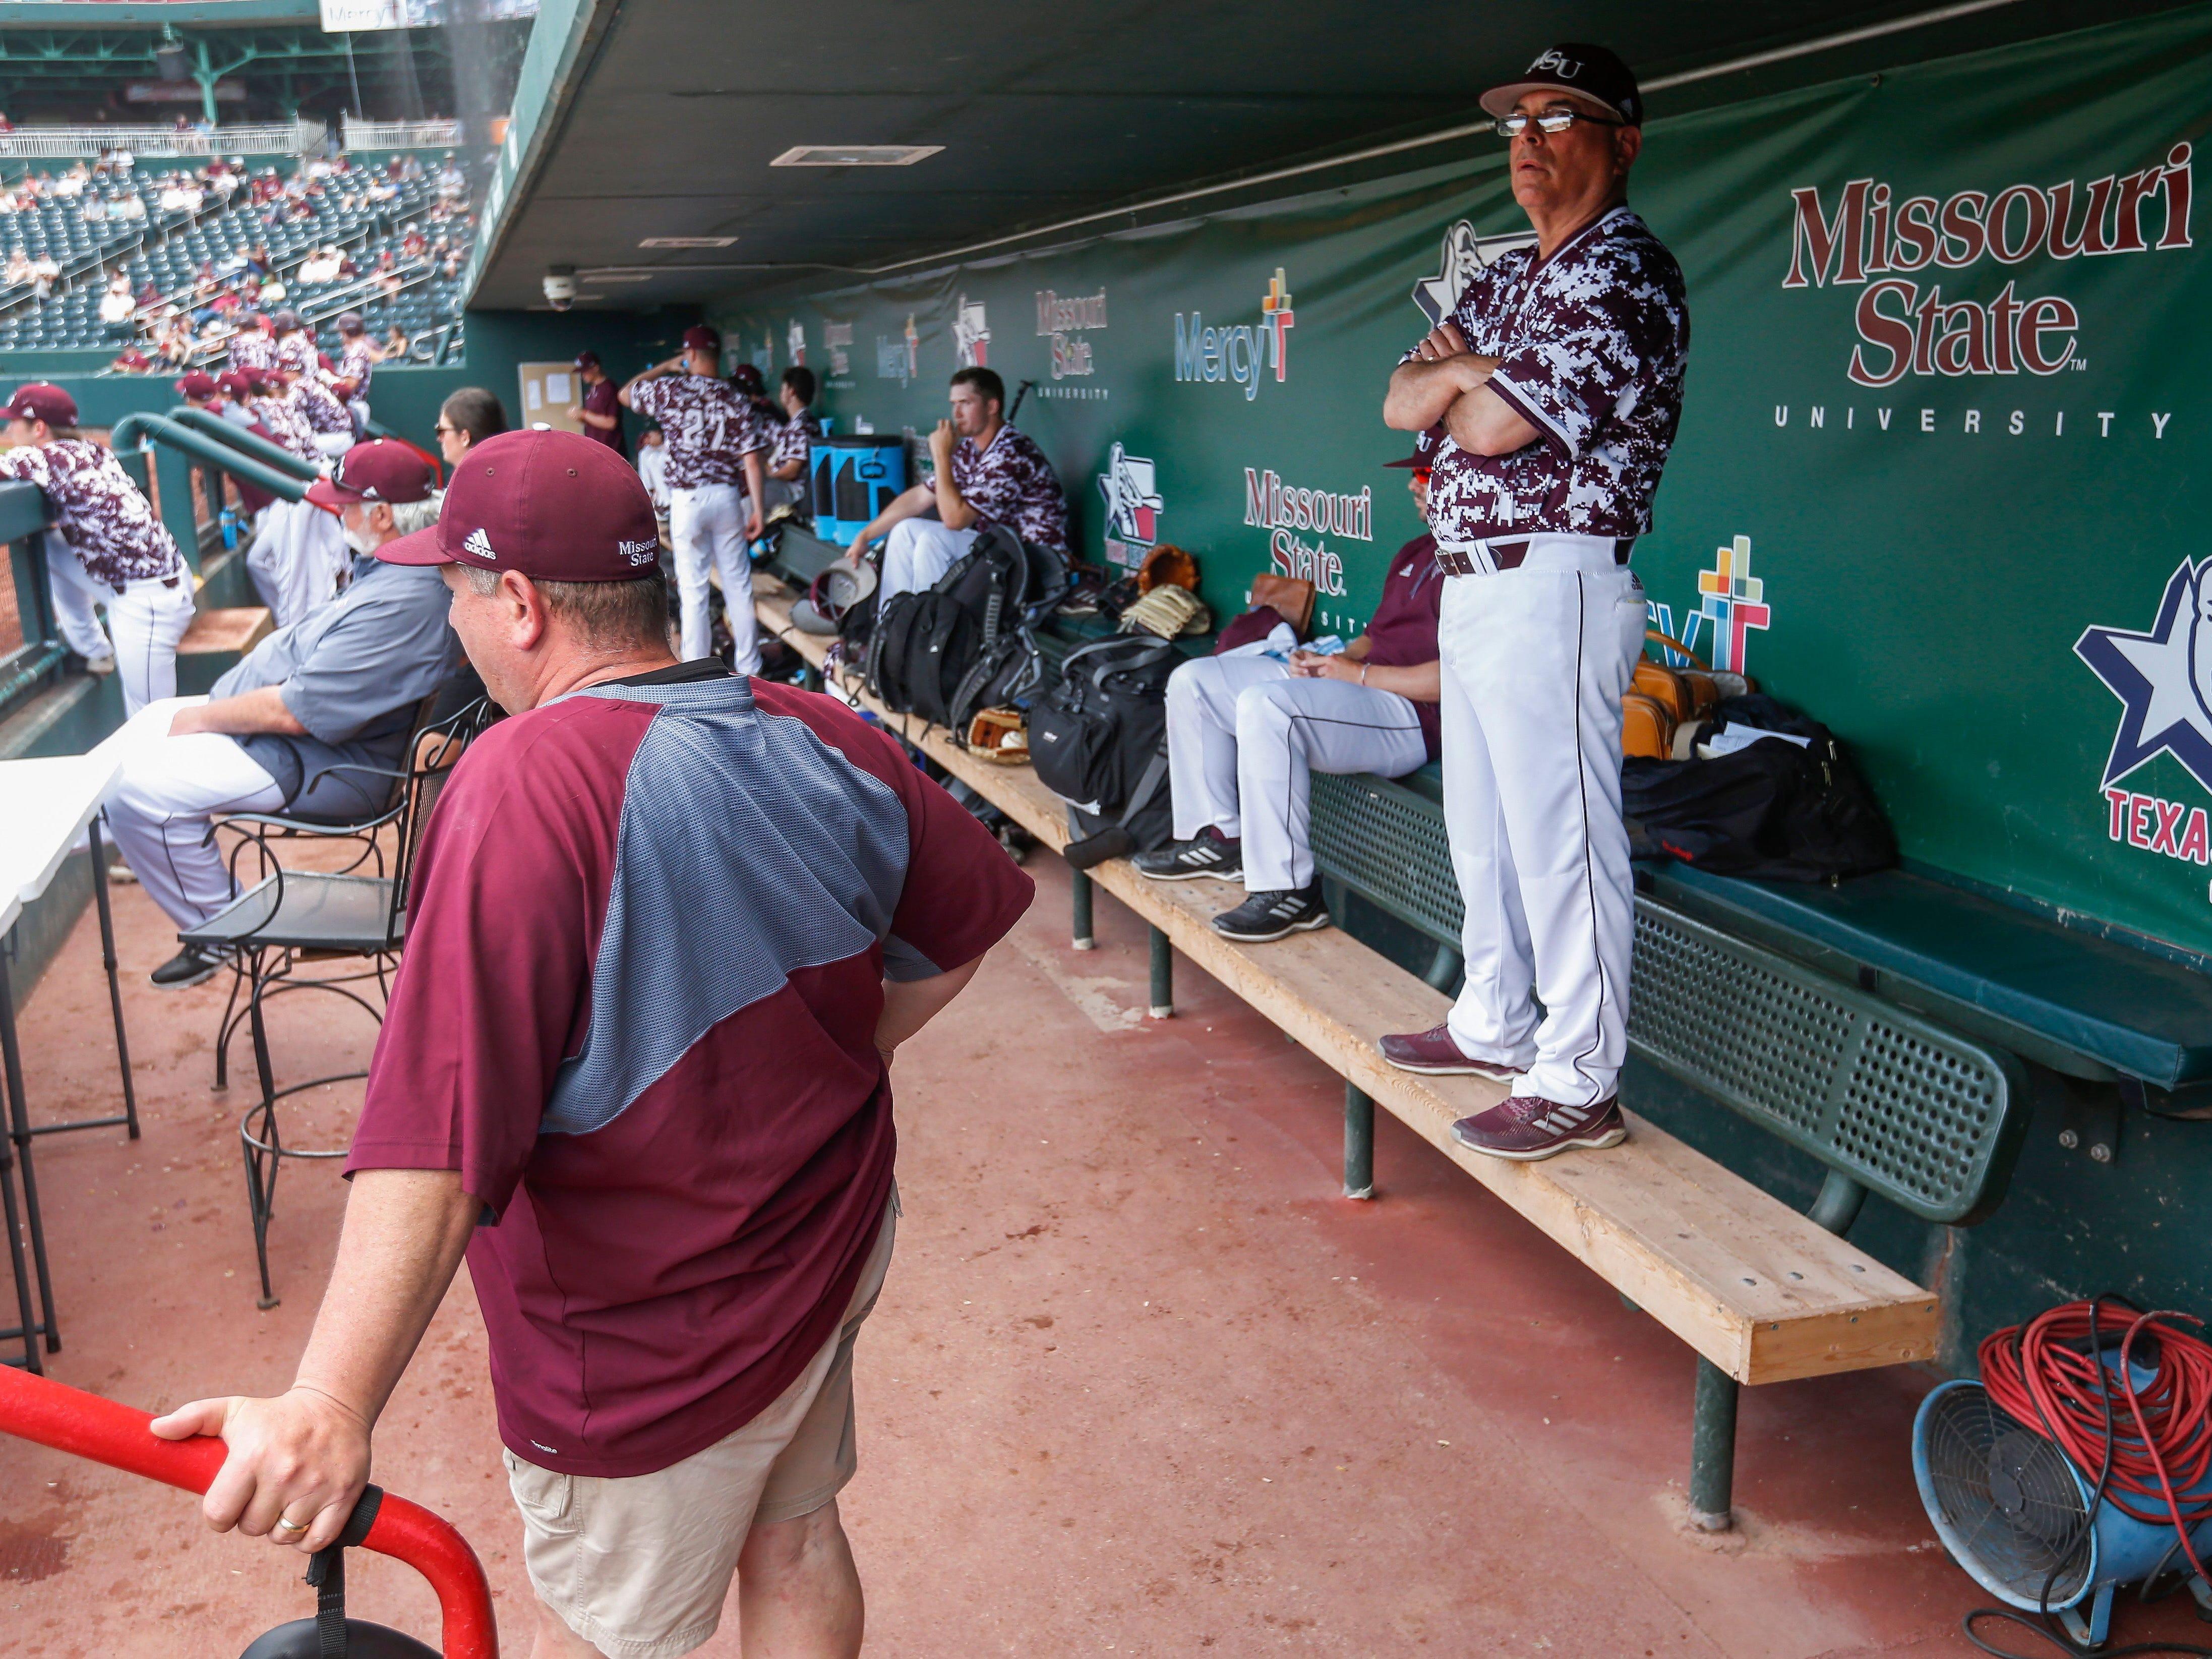 June 3: Missouri State's baseball season ends in NCAA tournament.